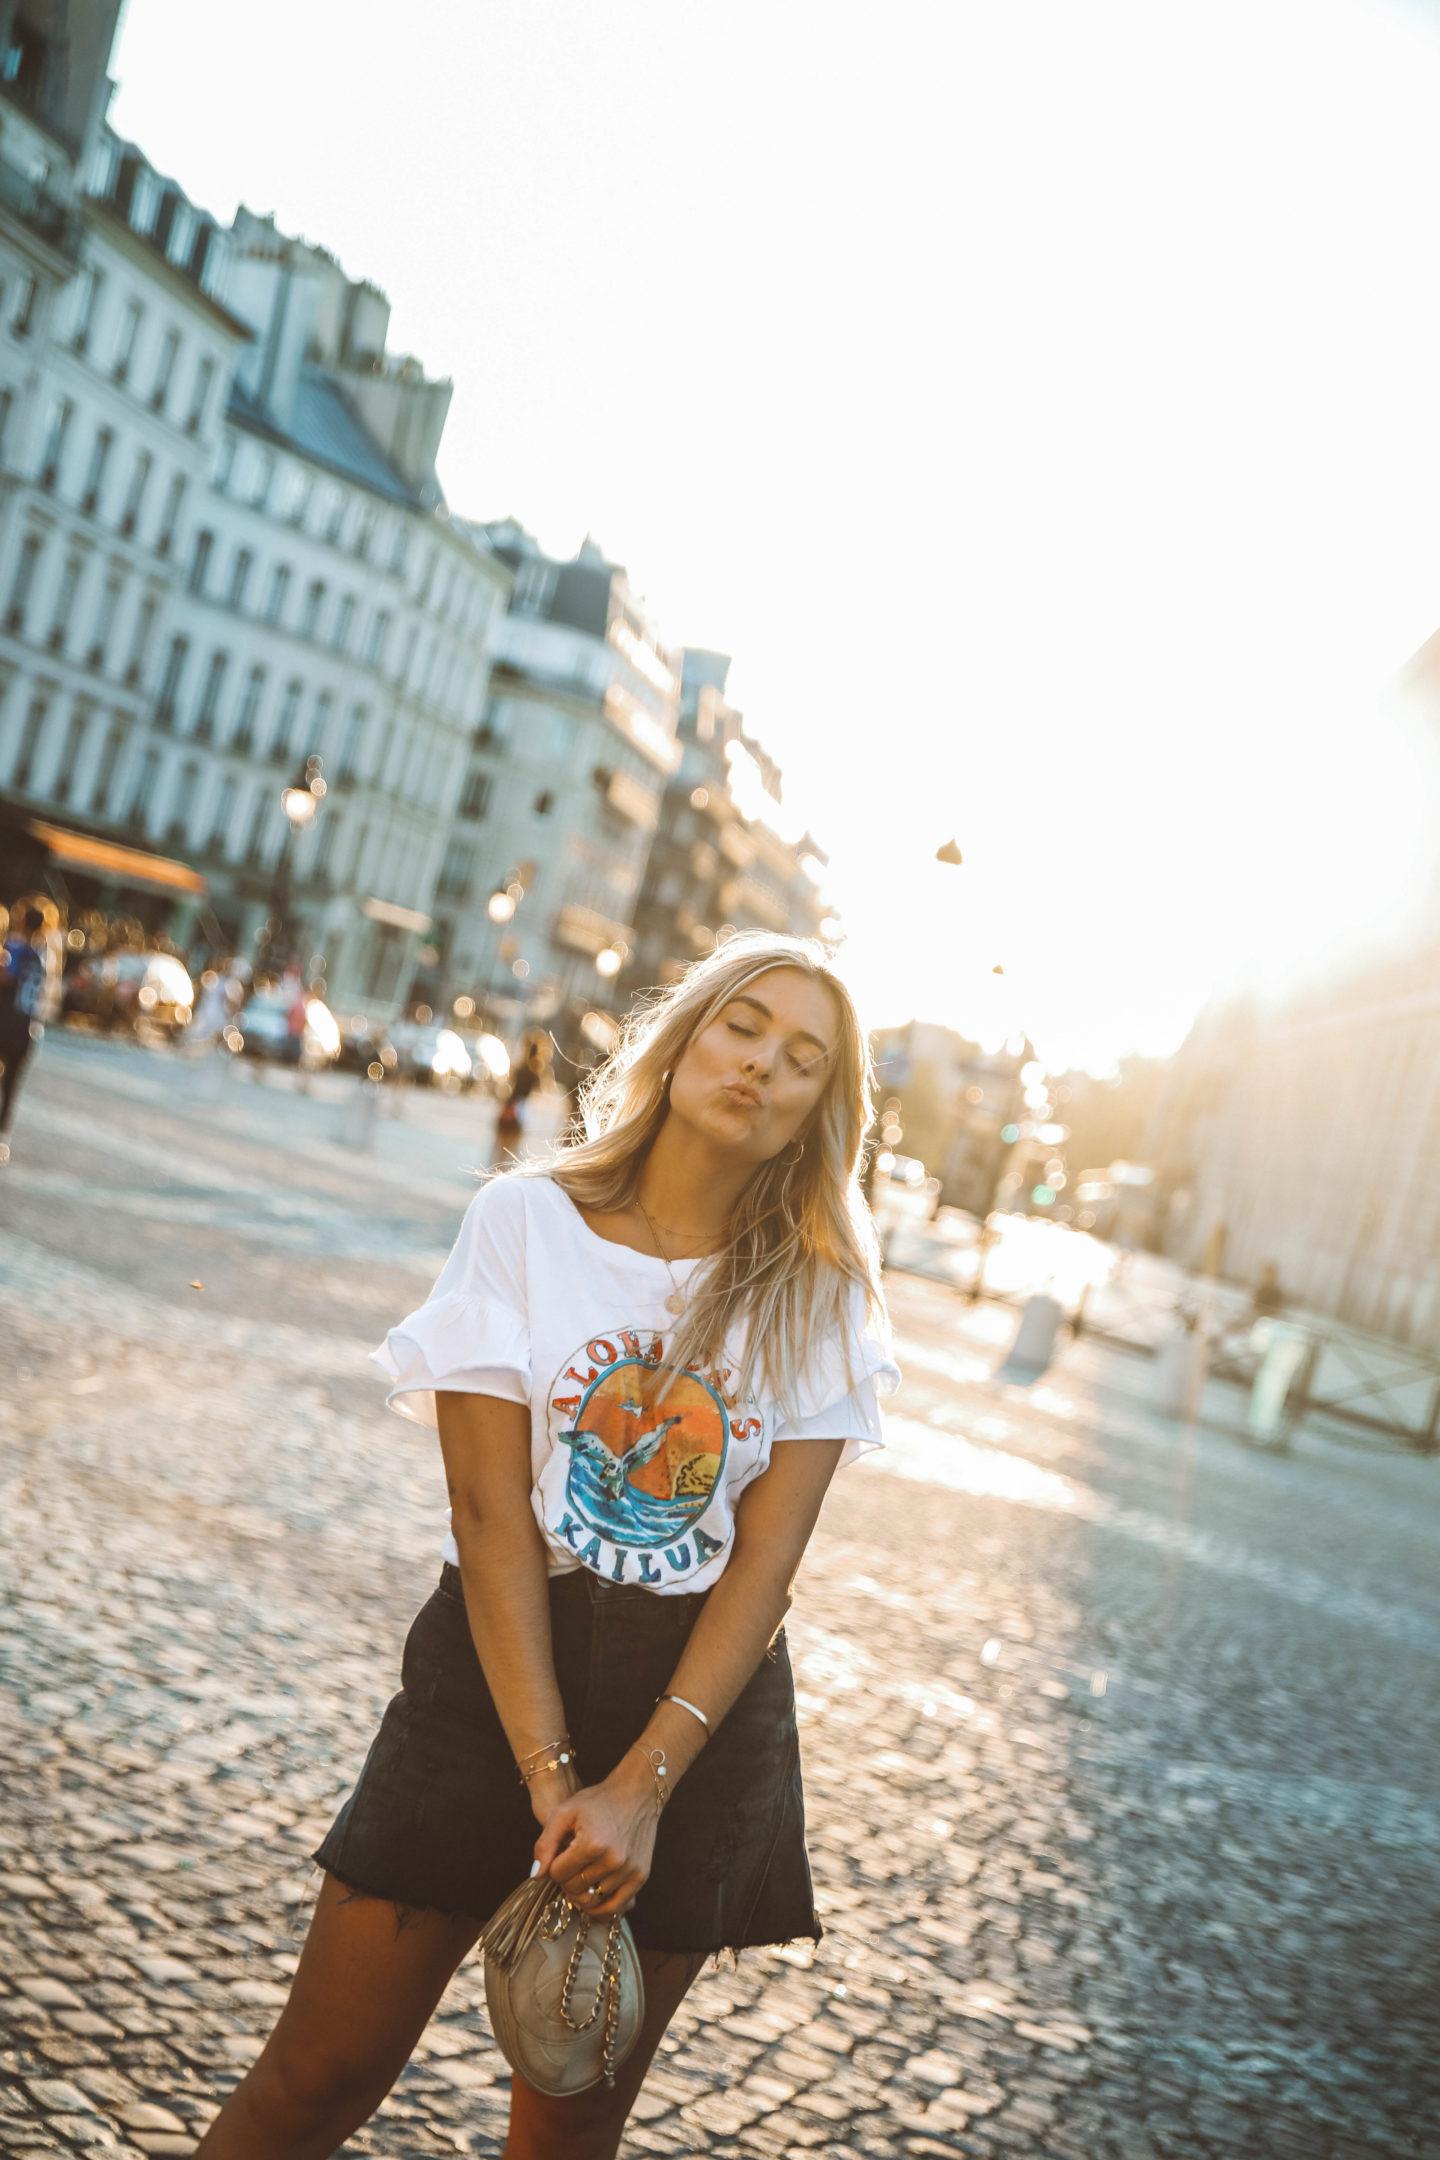 Jupe Revolve Clothing - Blondie Baby blog mode Paris et voyages